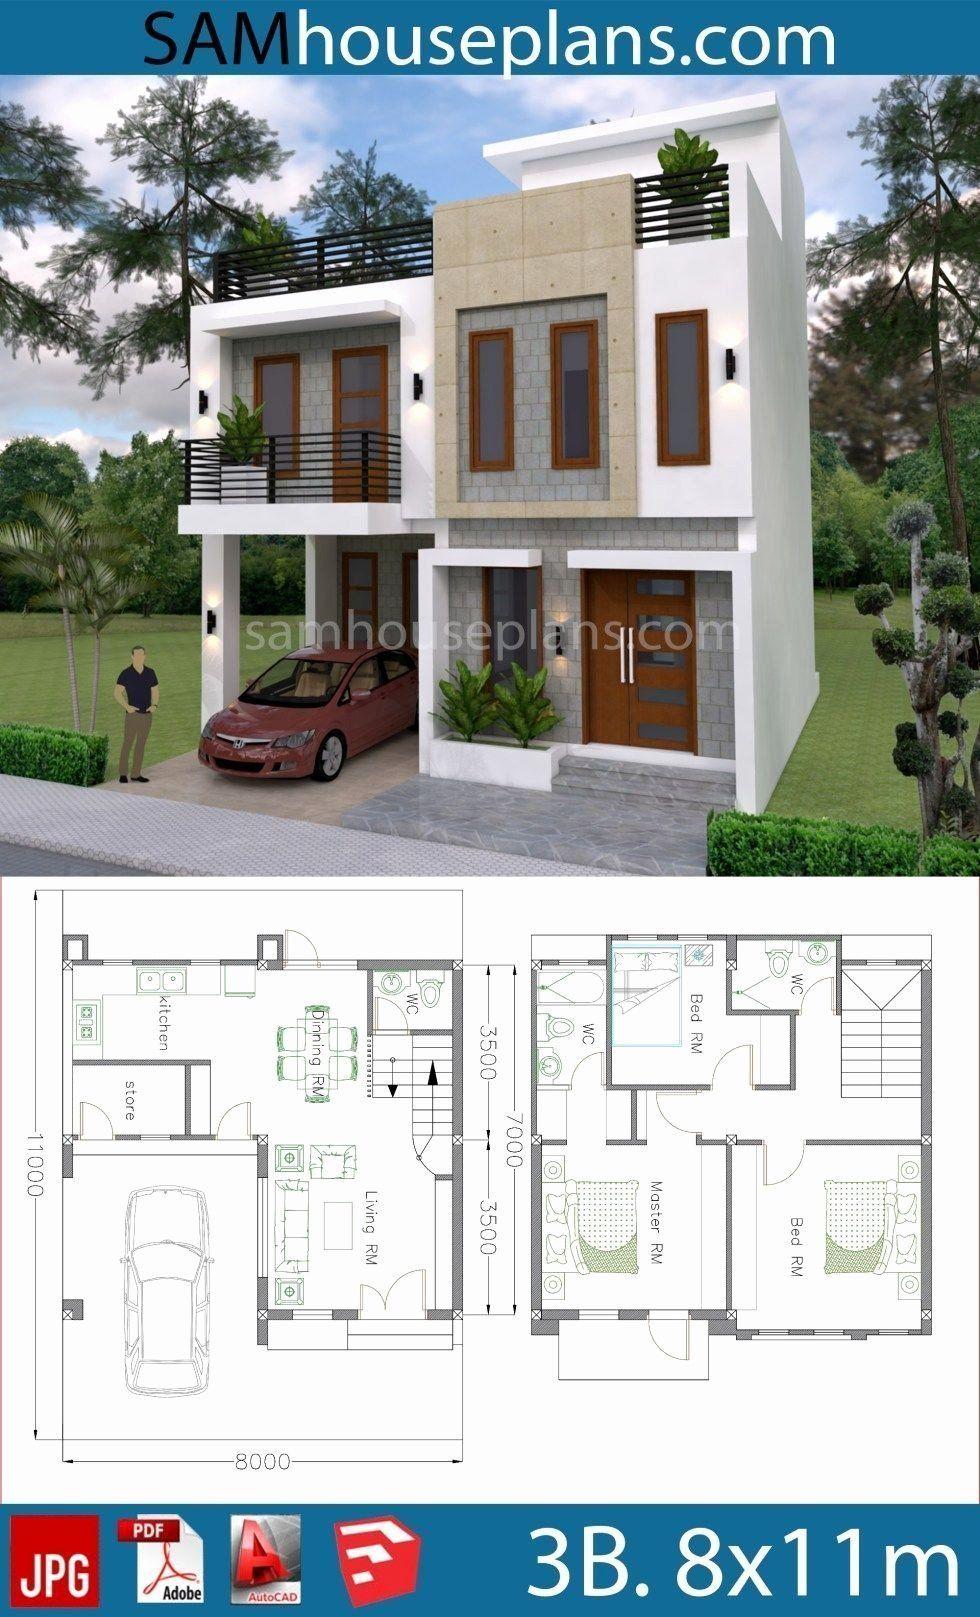 Duplex Home Design Plans 3d New House Plans 8x11m With 3 Bedrooms Sam House Plans Model House Plan House Construction Plan Indian House Plans